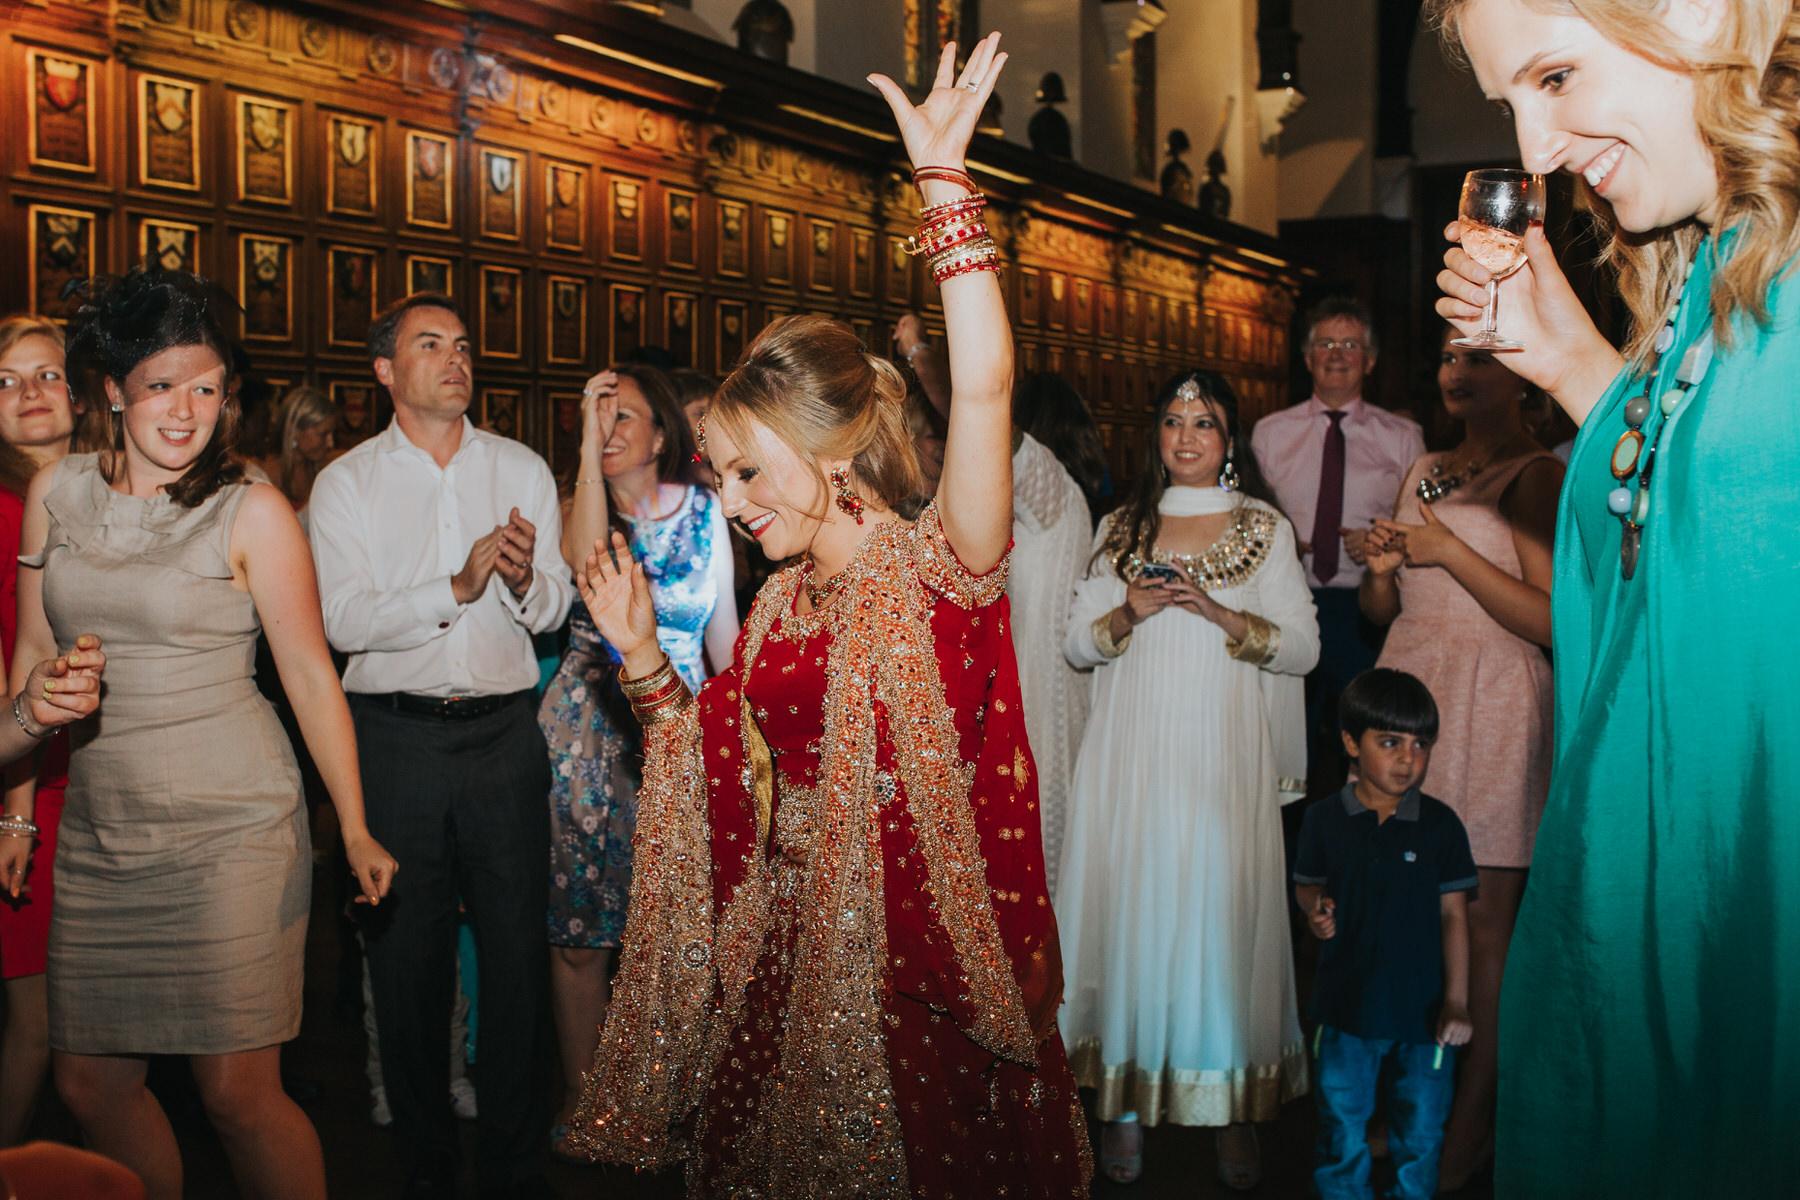 238-Anglo-Asian-London-Wedding-bride-dancing-red-sari.jpg